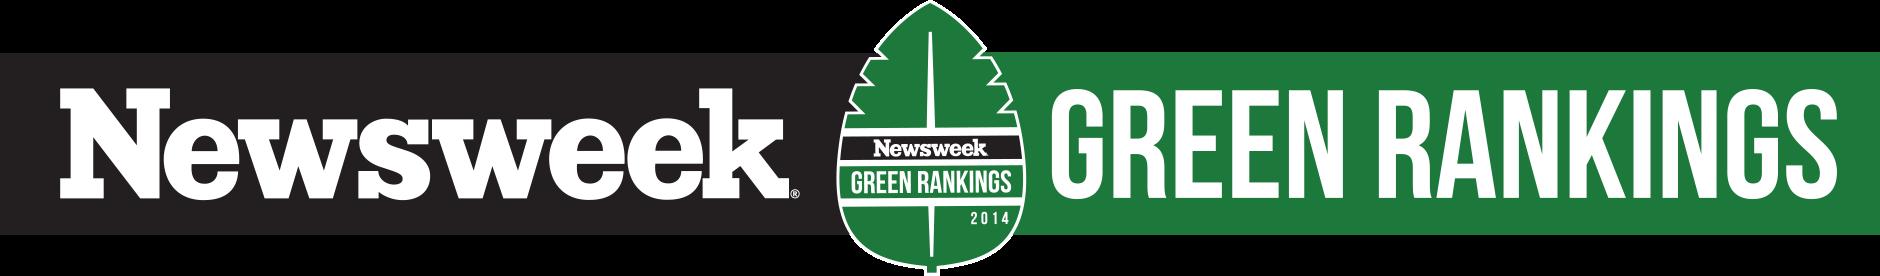 green-rankings-logo-hi